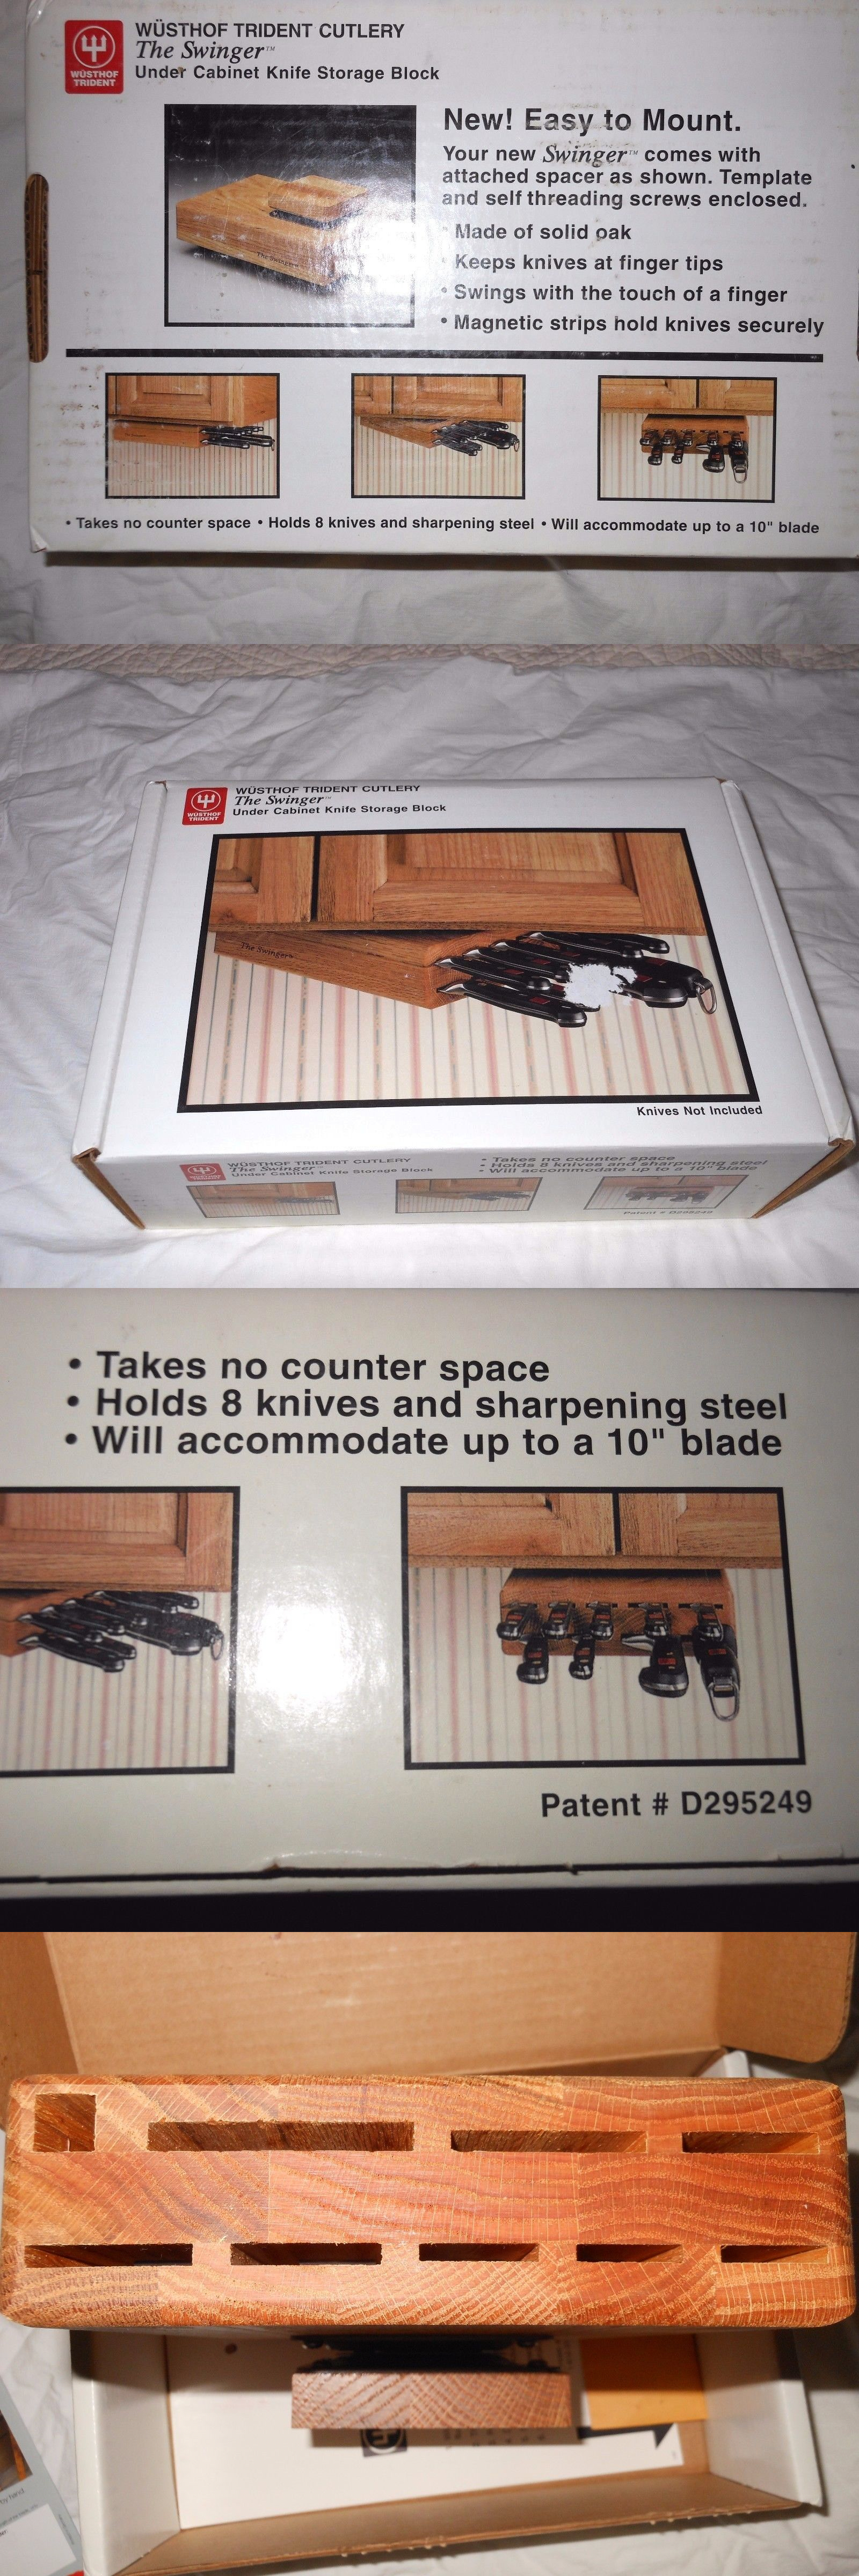 Knife Blocks And Storage 20638: Nib Wusthof Trident Cutlery Block Under  Cabinet The Swinger Wood